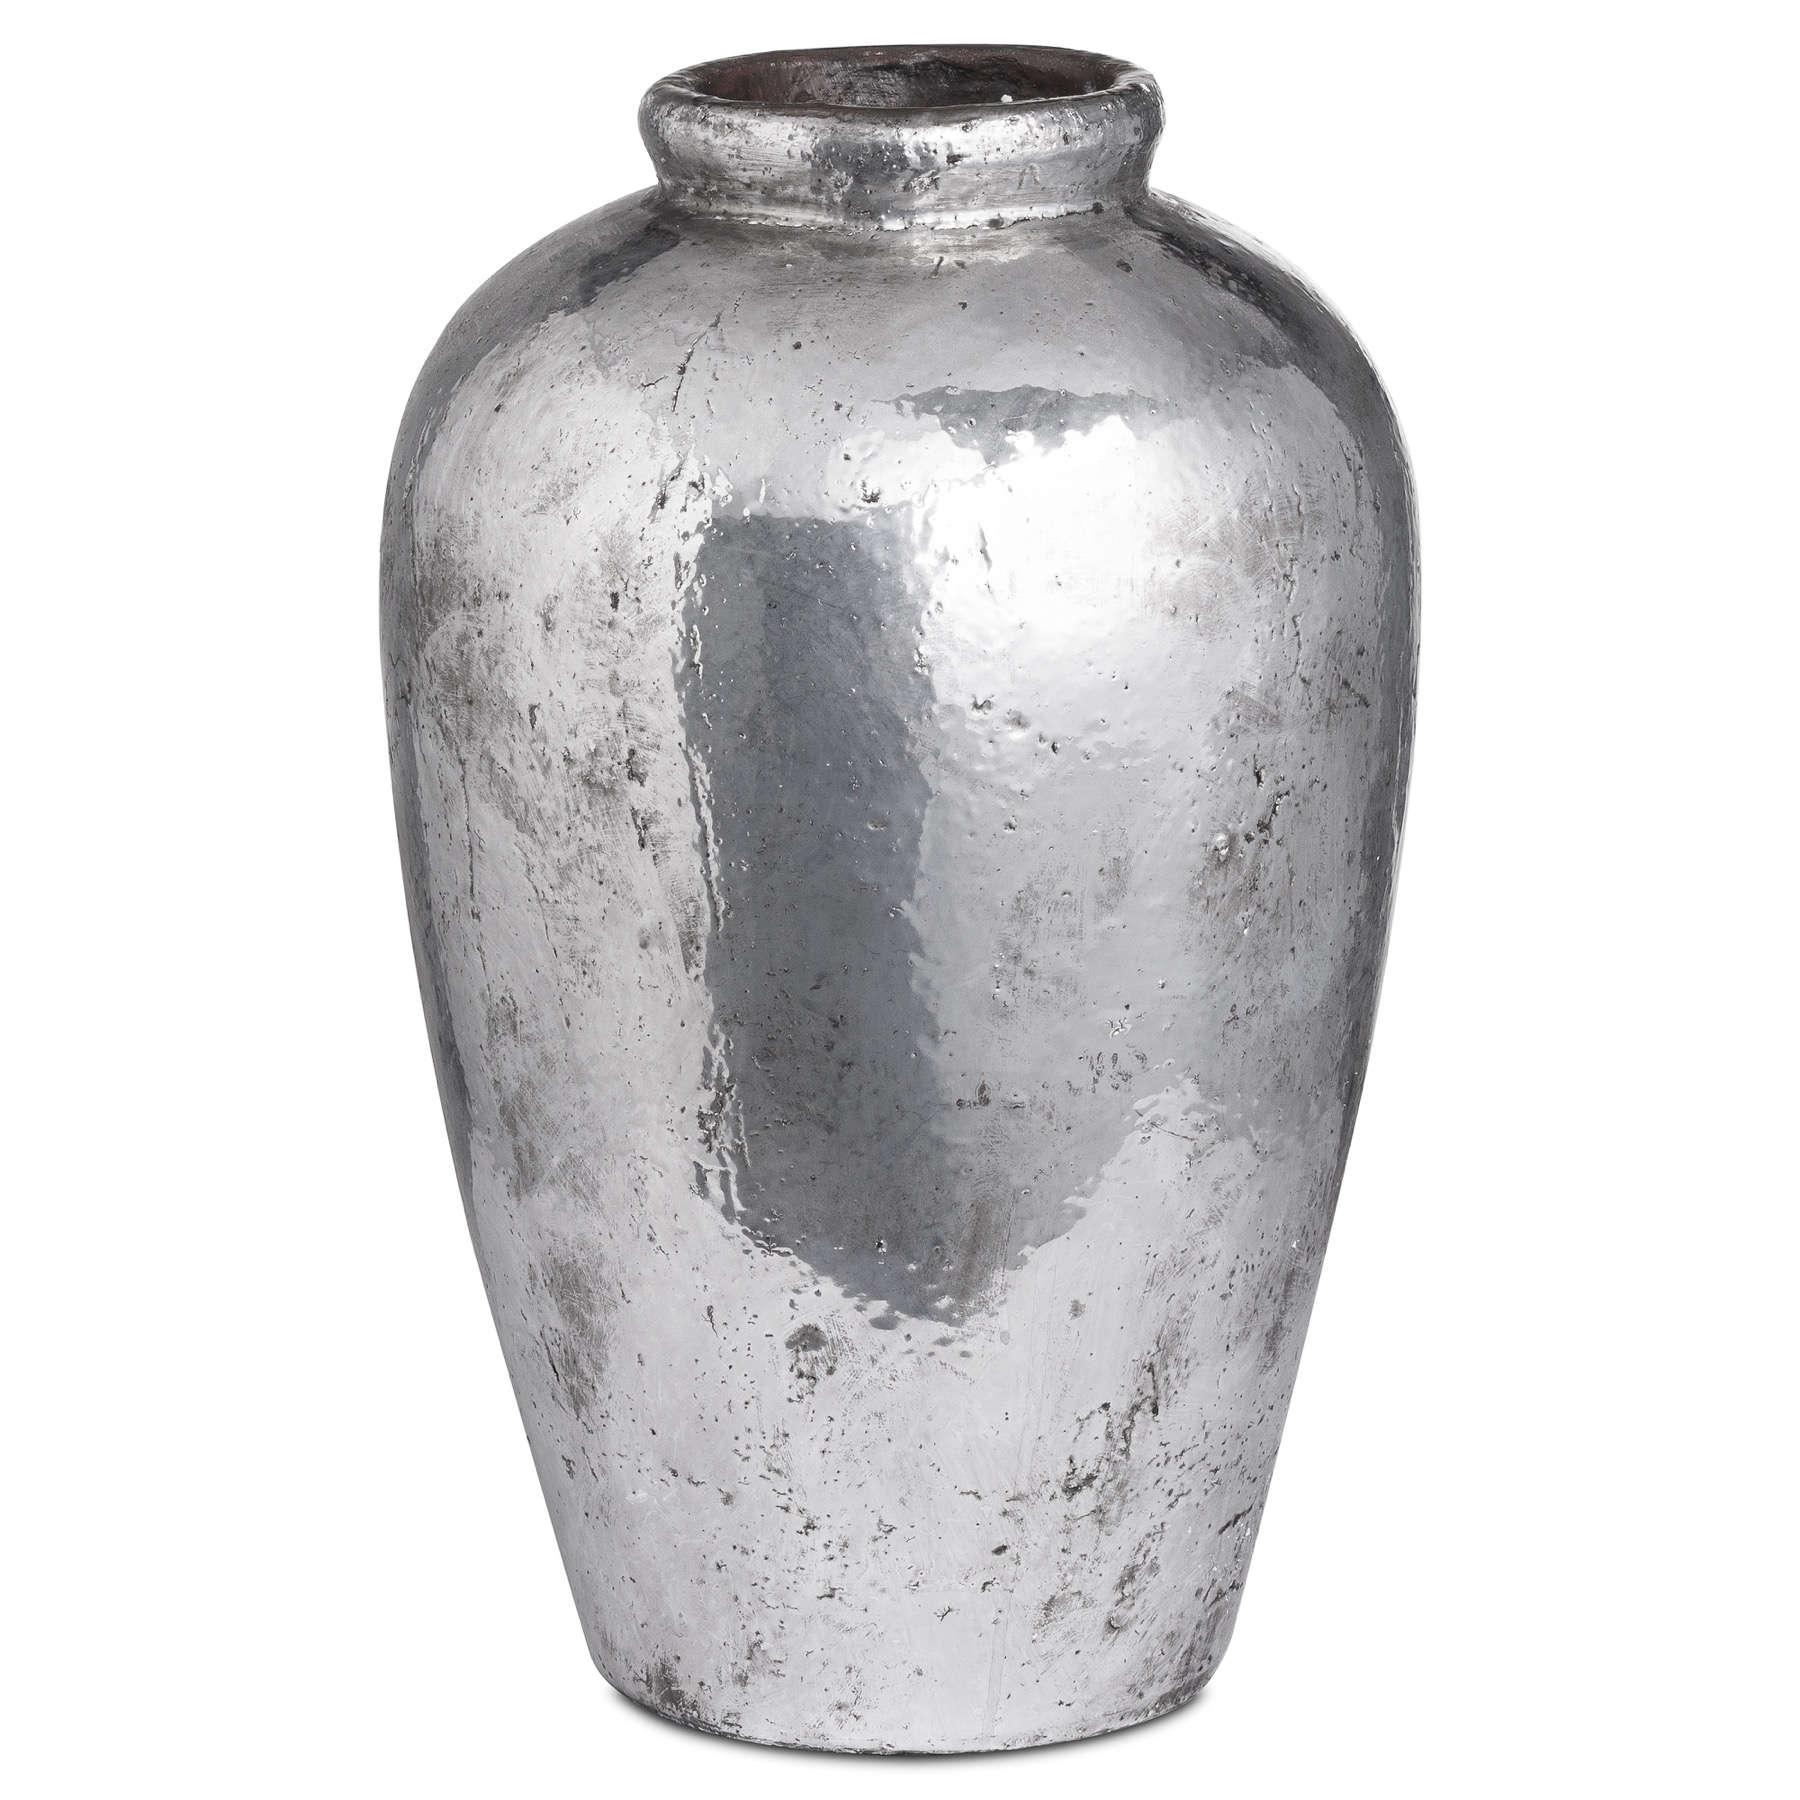 Tall Metallic Ceramic Vase - Image 1